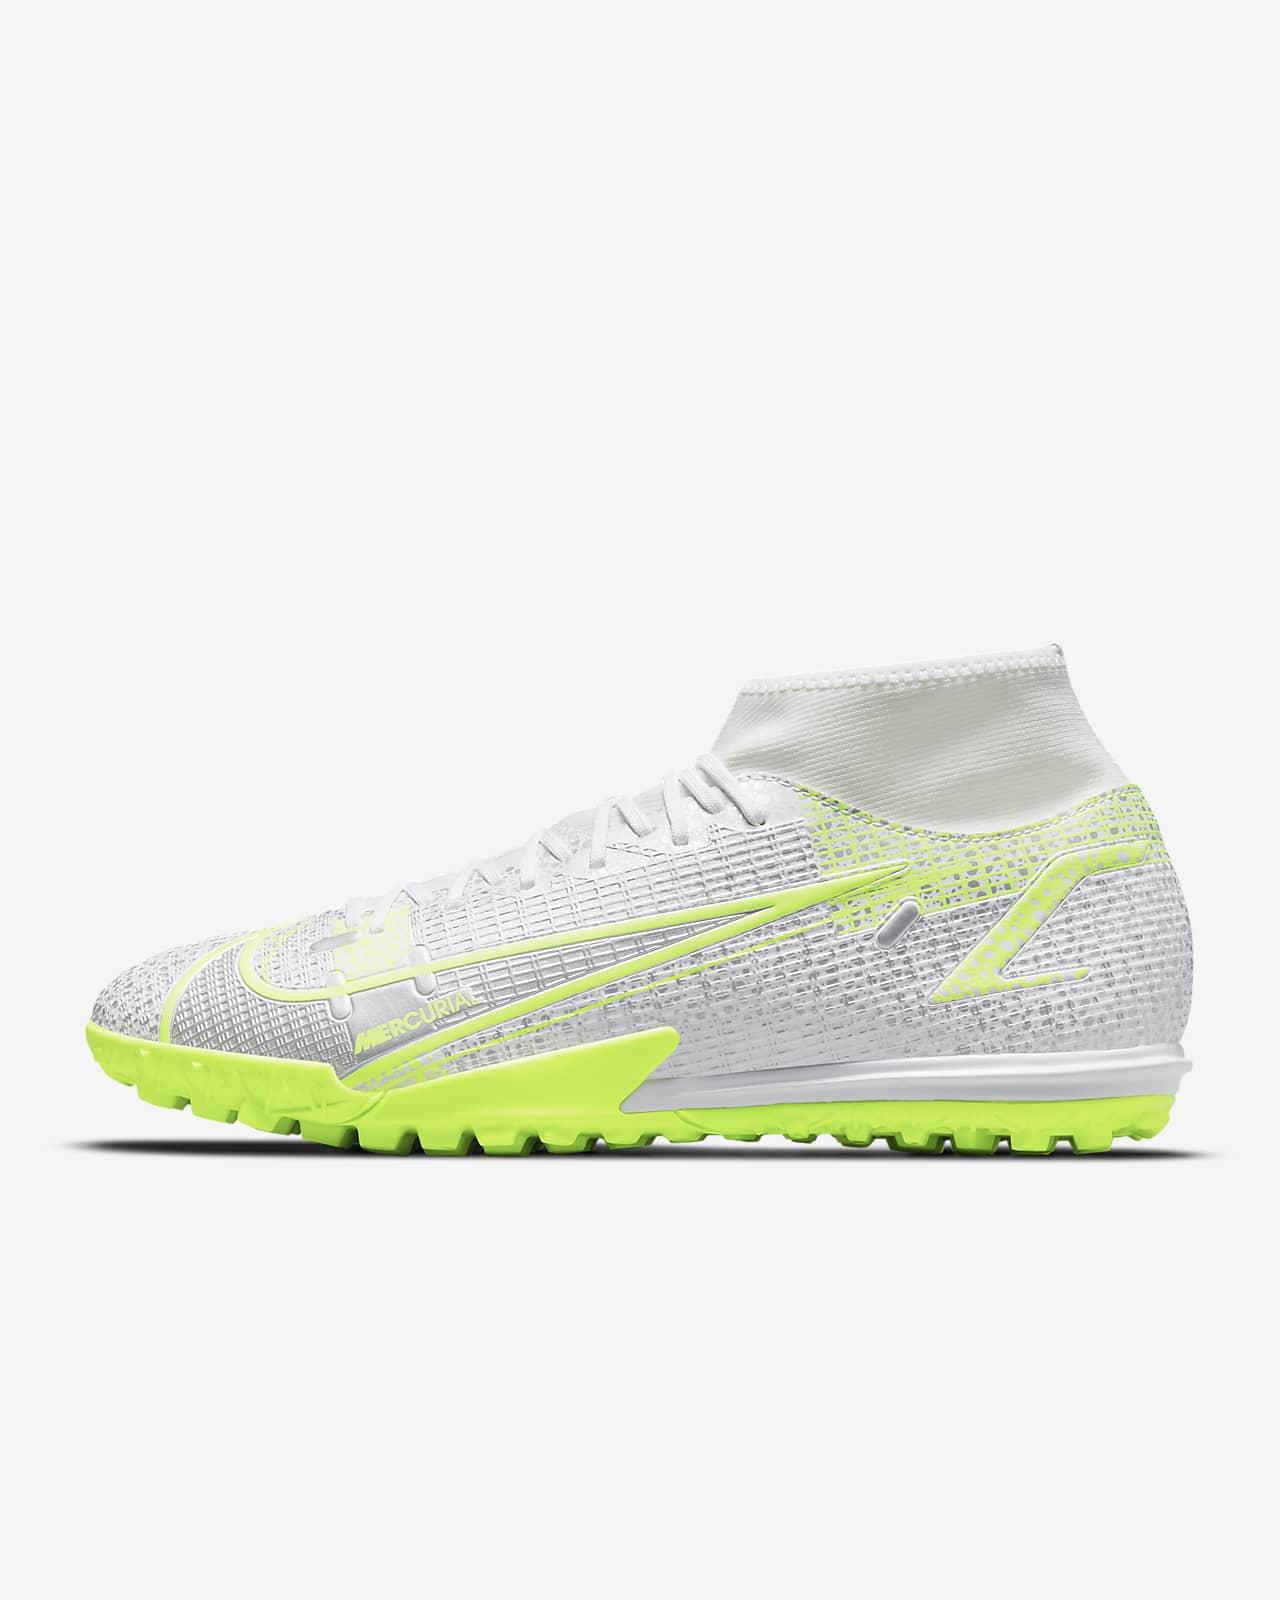 Calzado de fútbol para pasto sintético (turf) Nike Mercurial Superfly 8 Academy TF